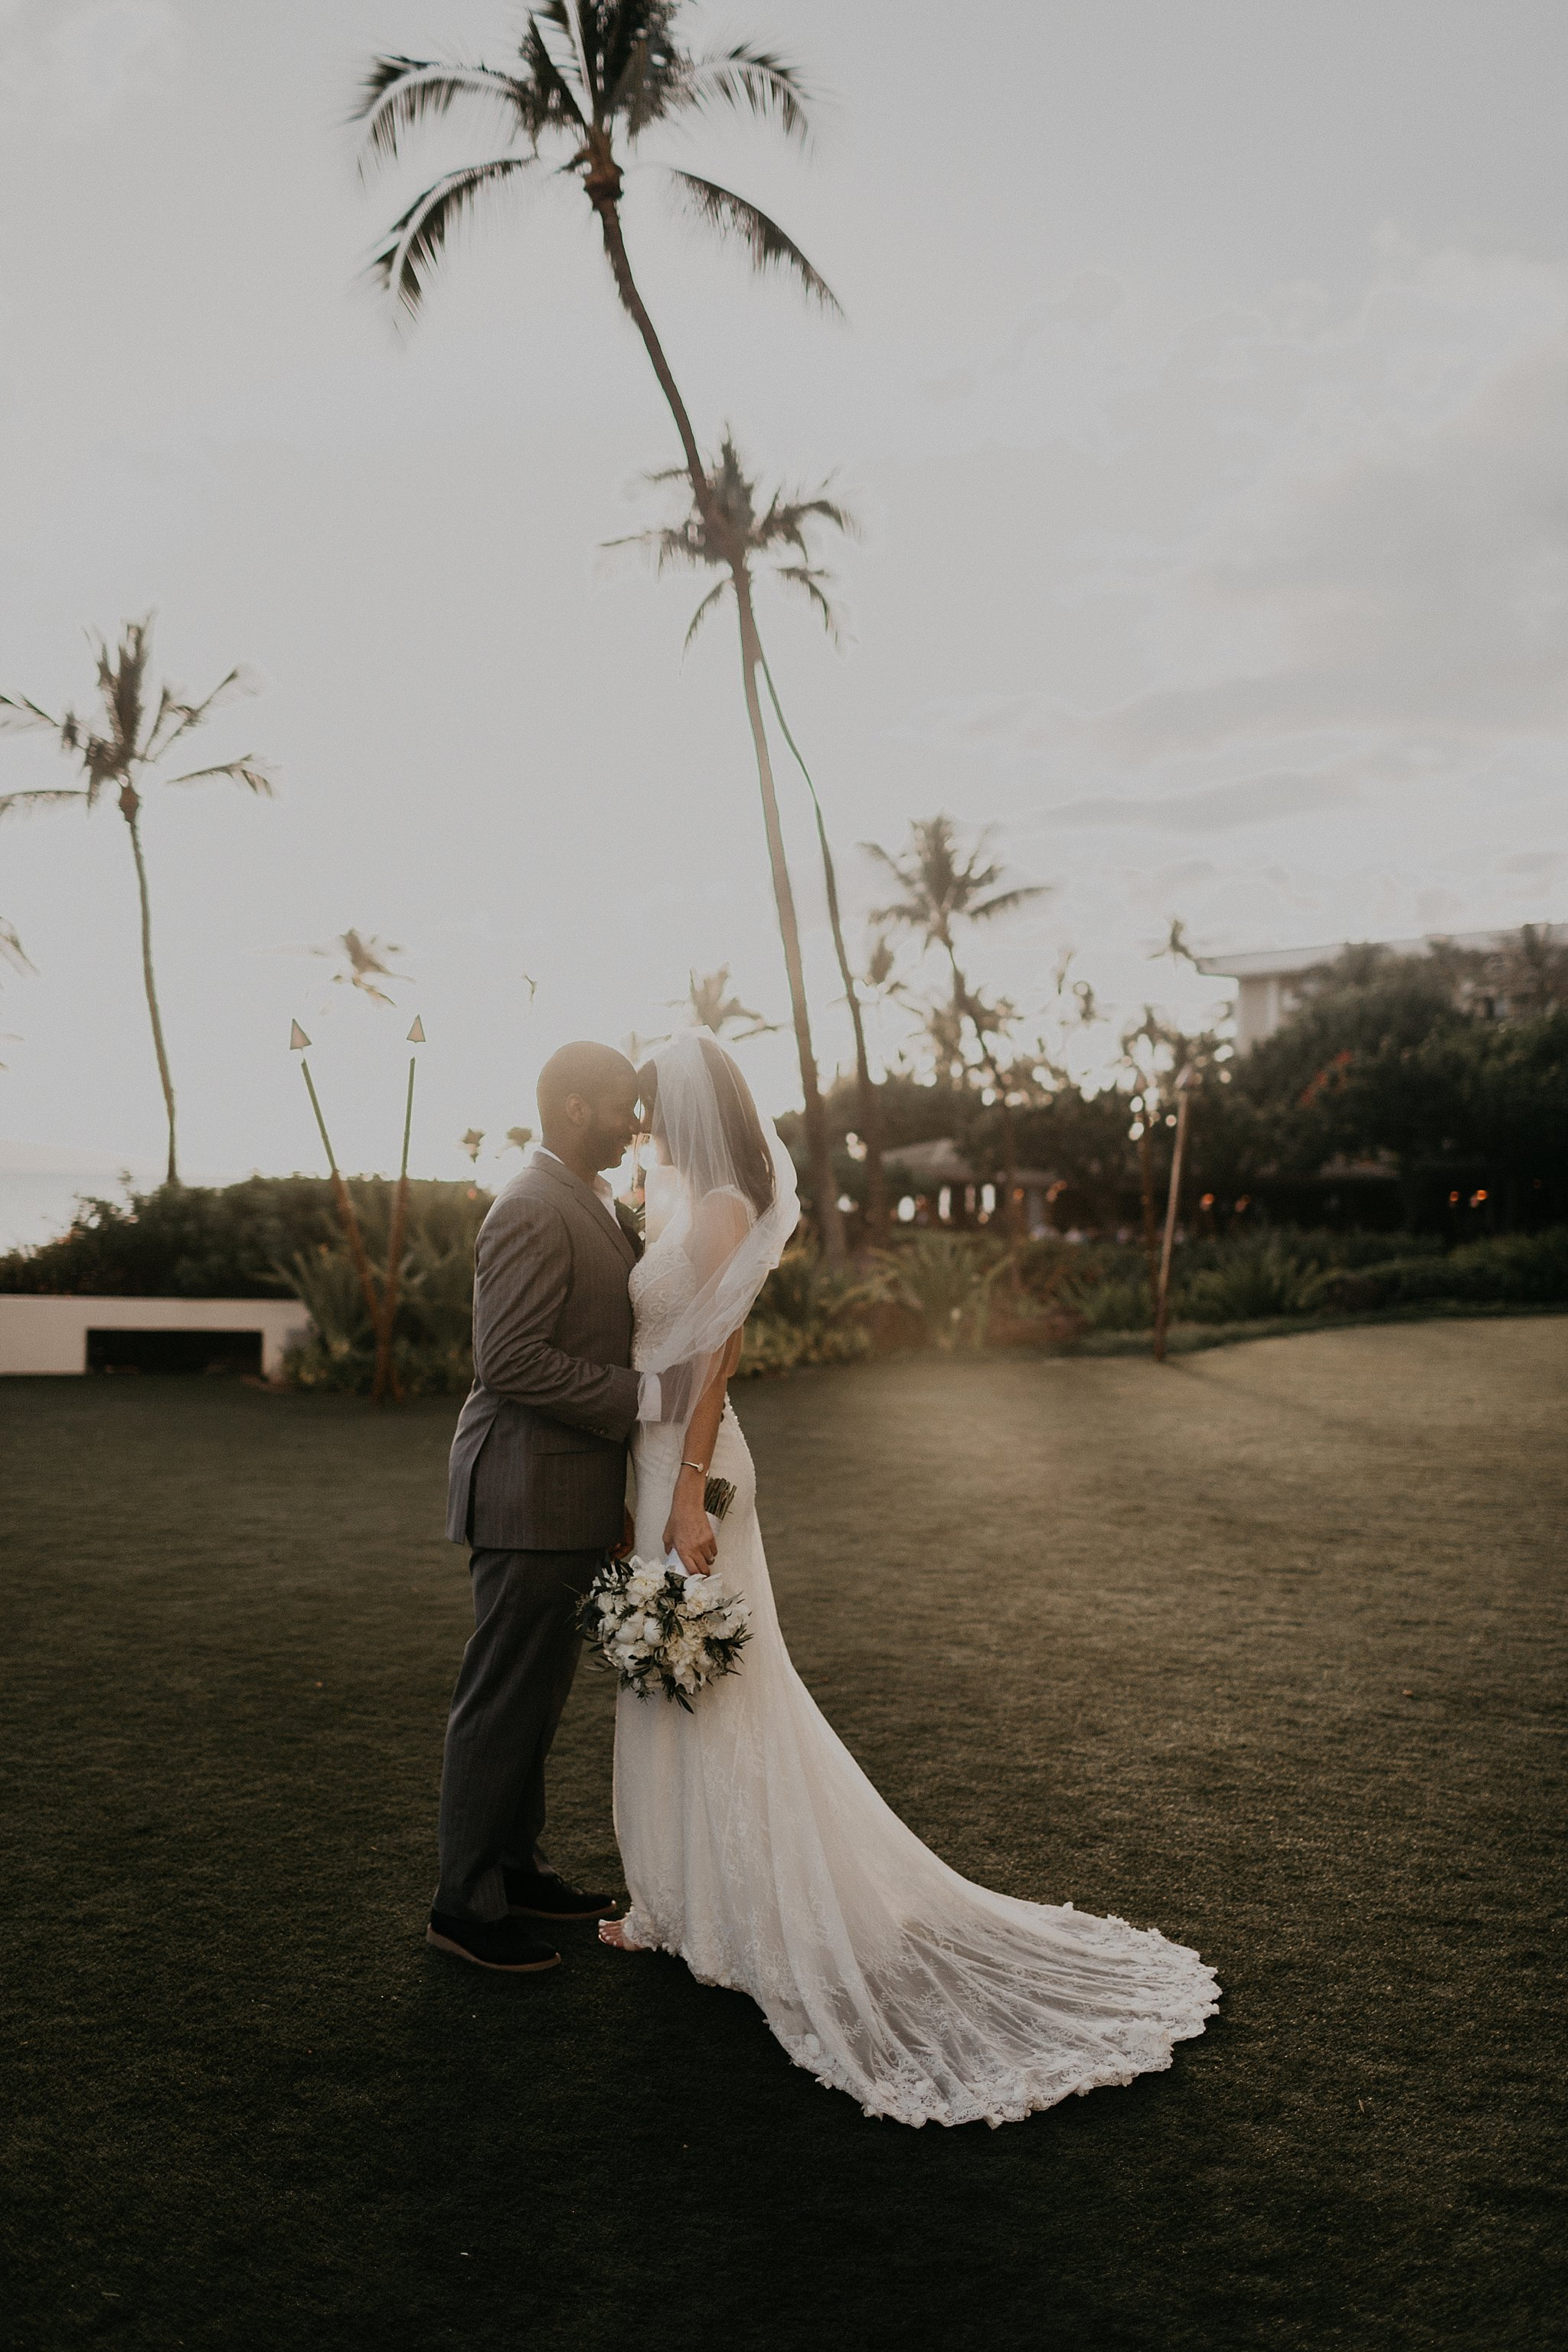 samantha_mcfarlen_bellingham_washington_engagement_photography_seattle_wedding_photographer_0240.jpg